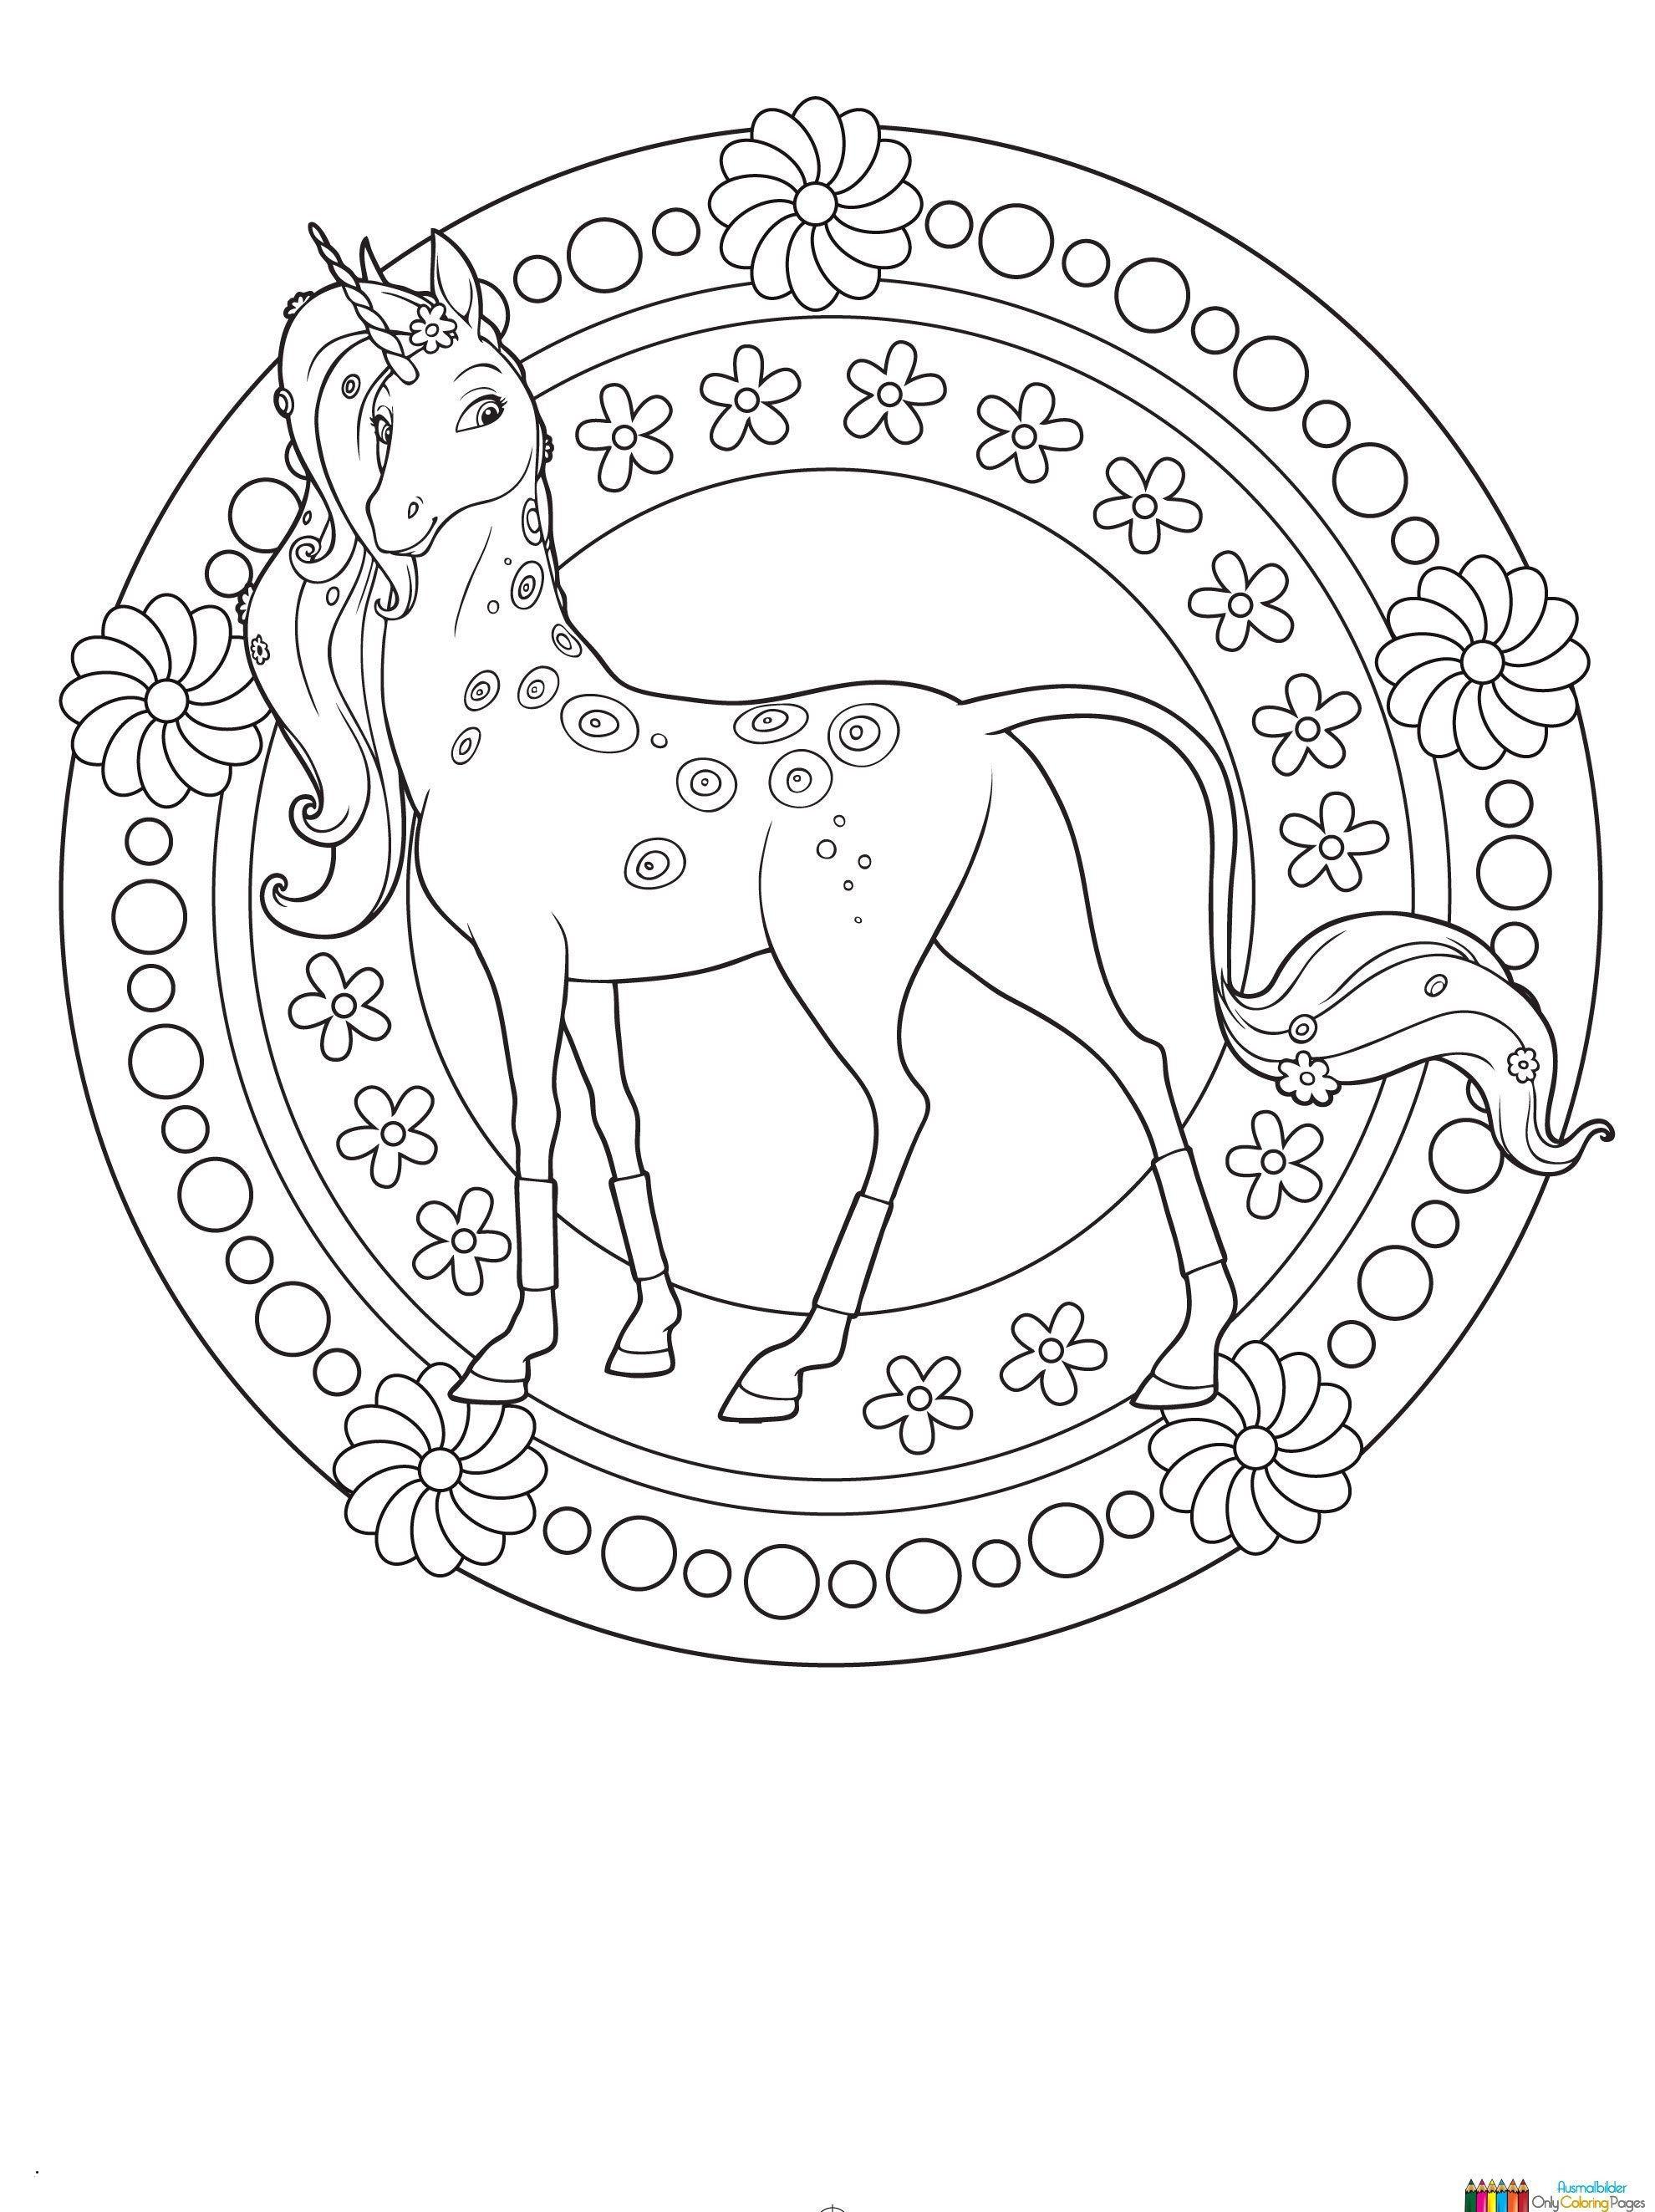 Harry Potter Ausmalbilder Wappen Frisch Ausmalbilder Bilder Uploadertalk Einzigartig Harry Potter Hogwarts Stock